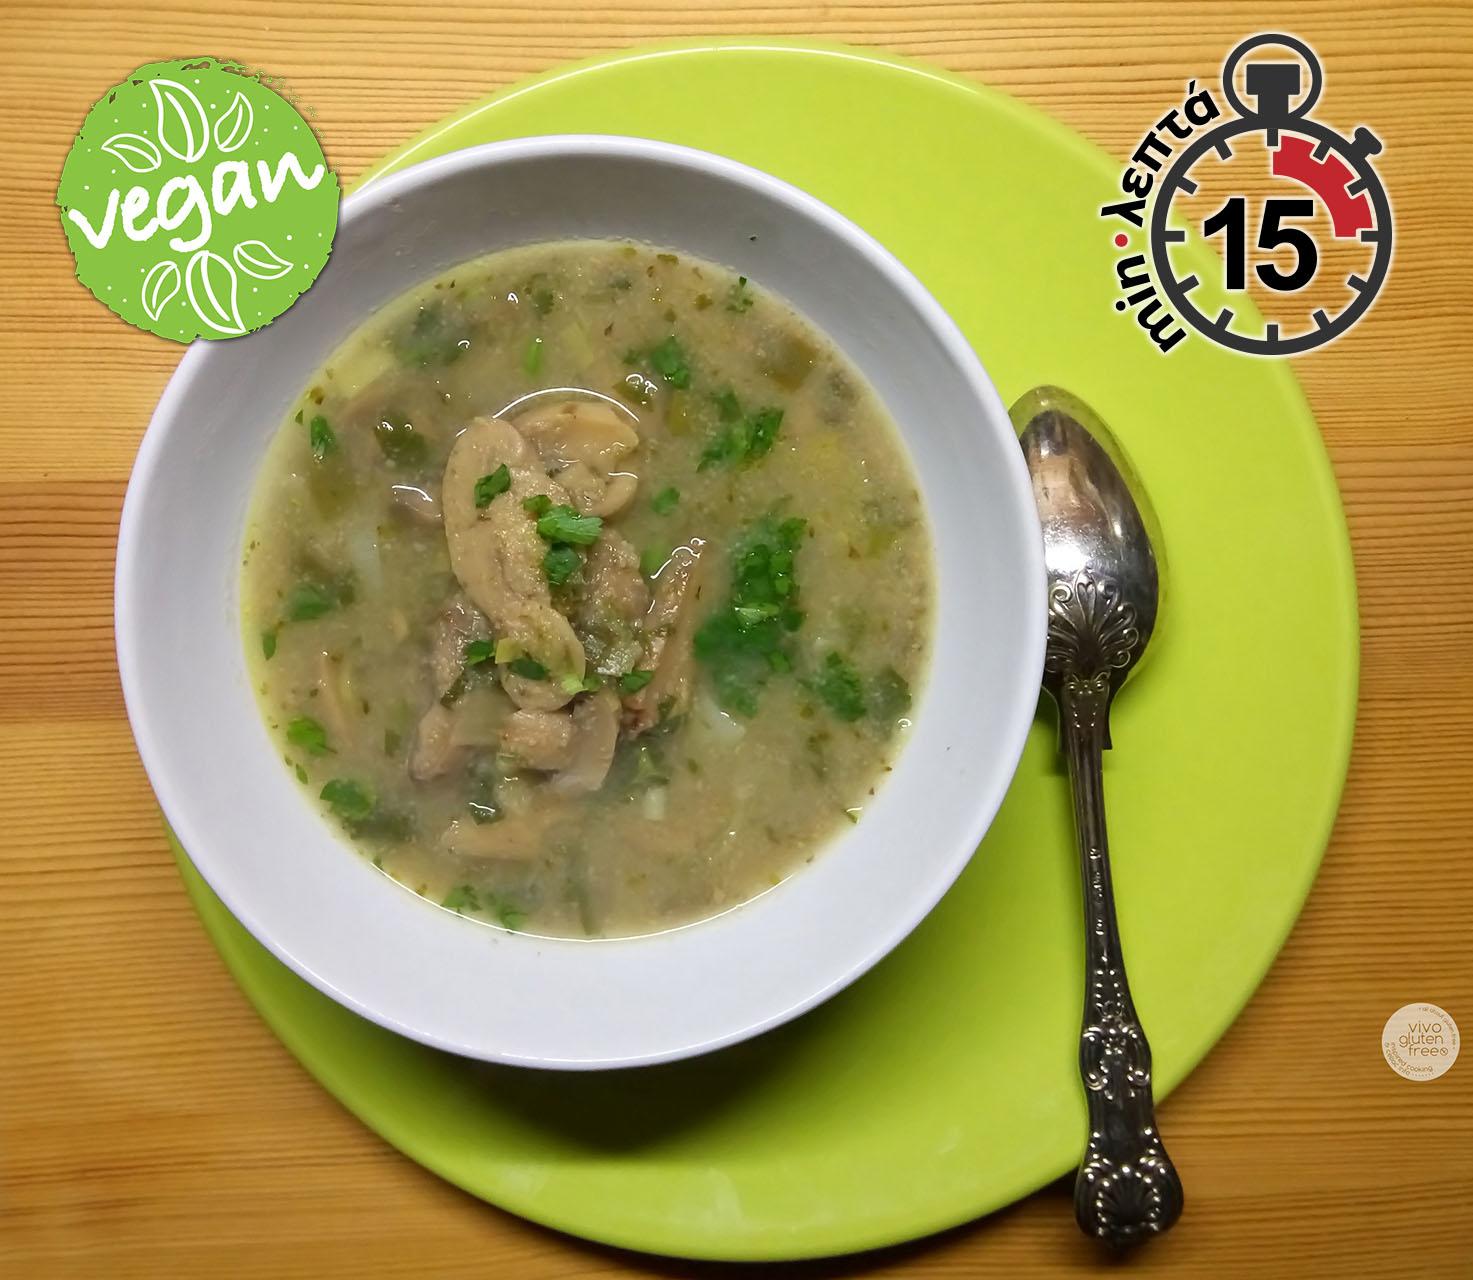 manitarosoupa-mushroom-soup-top